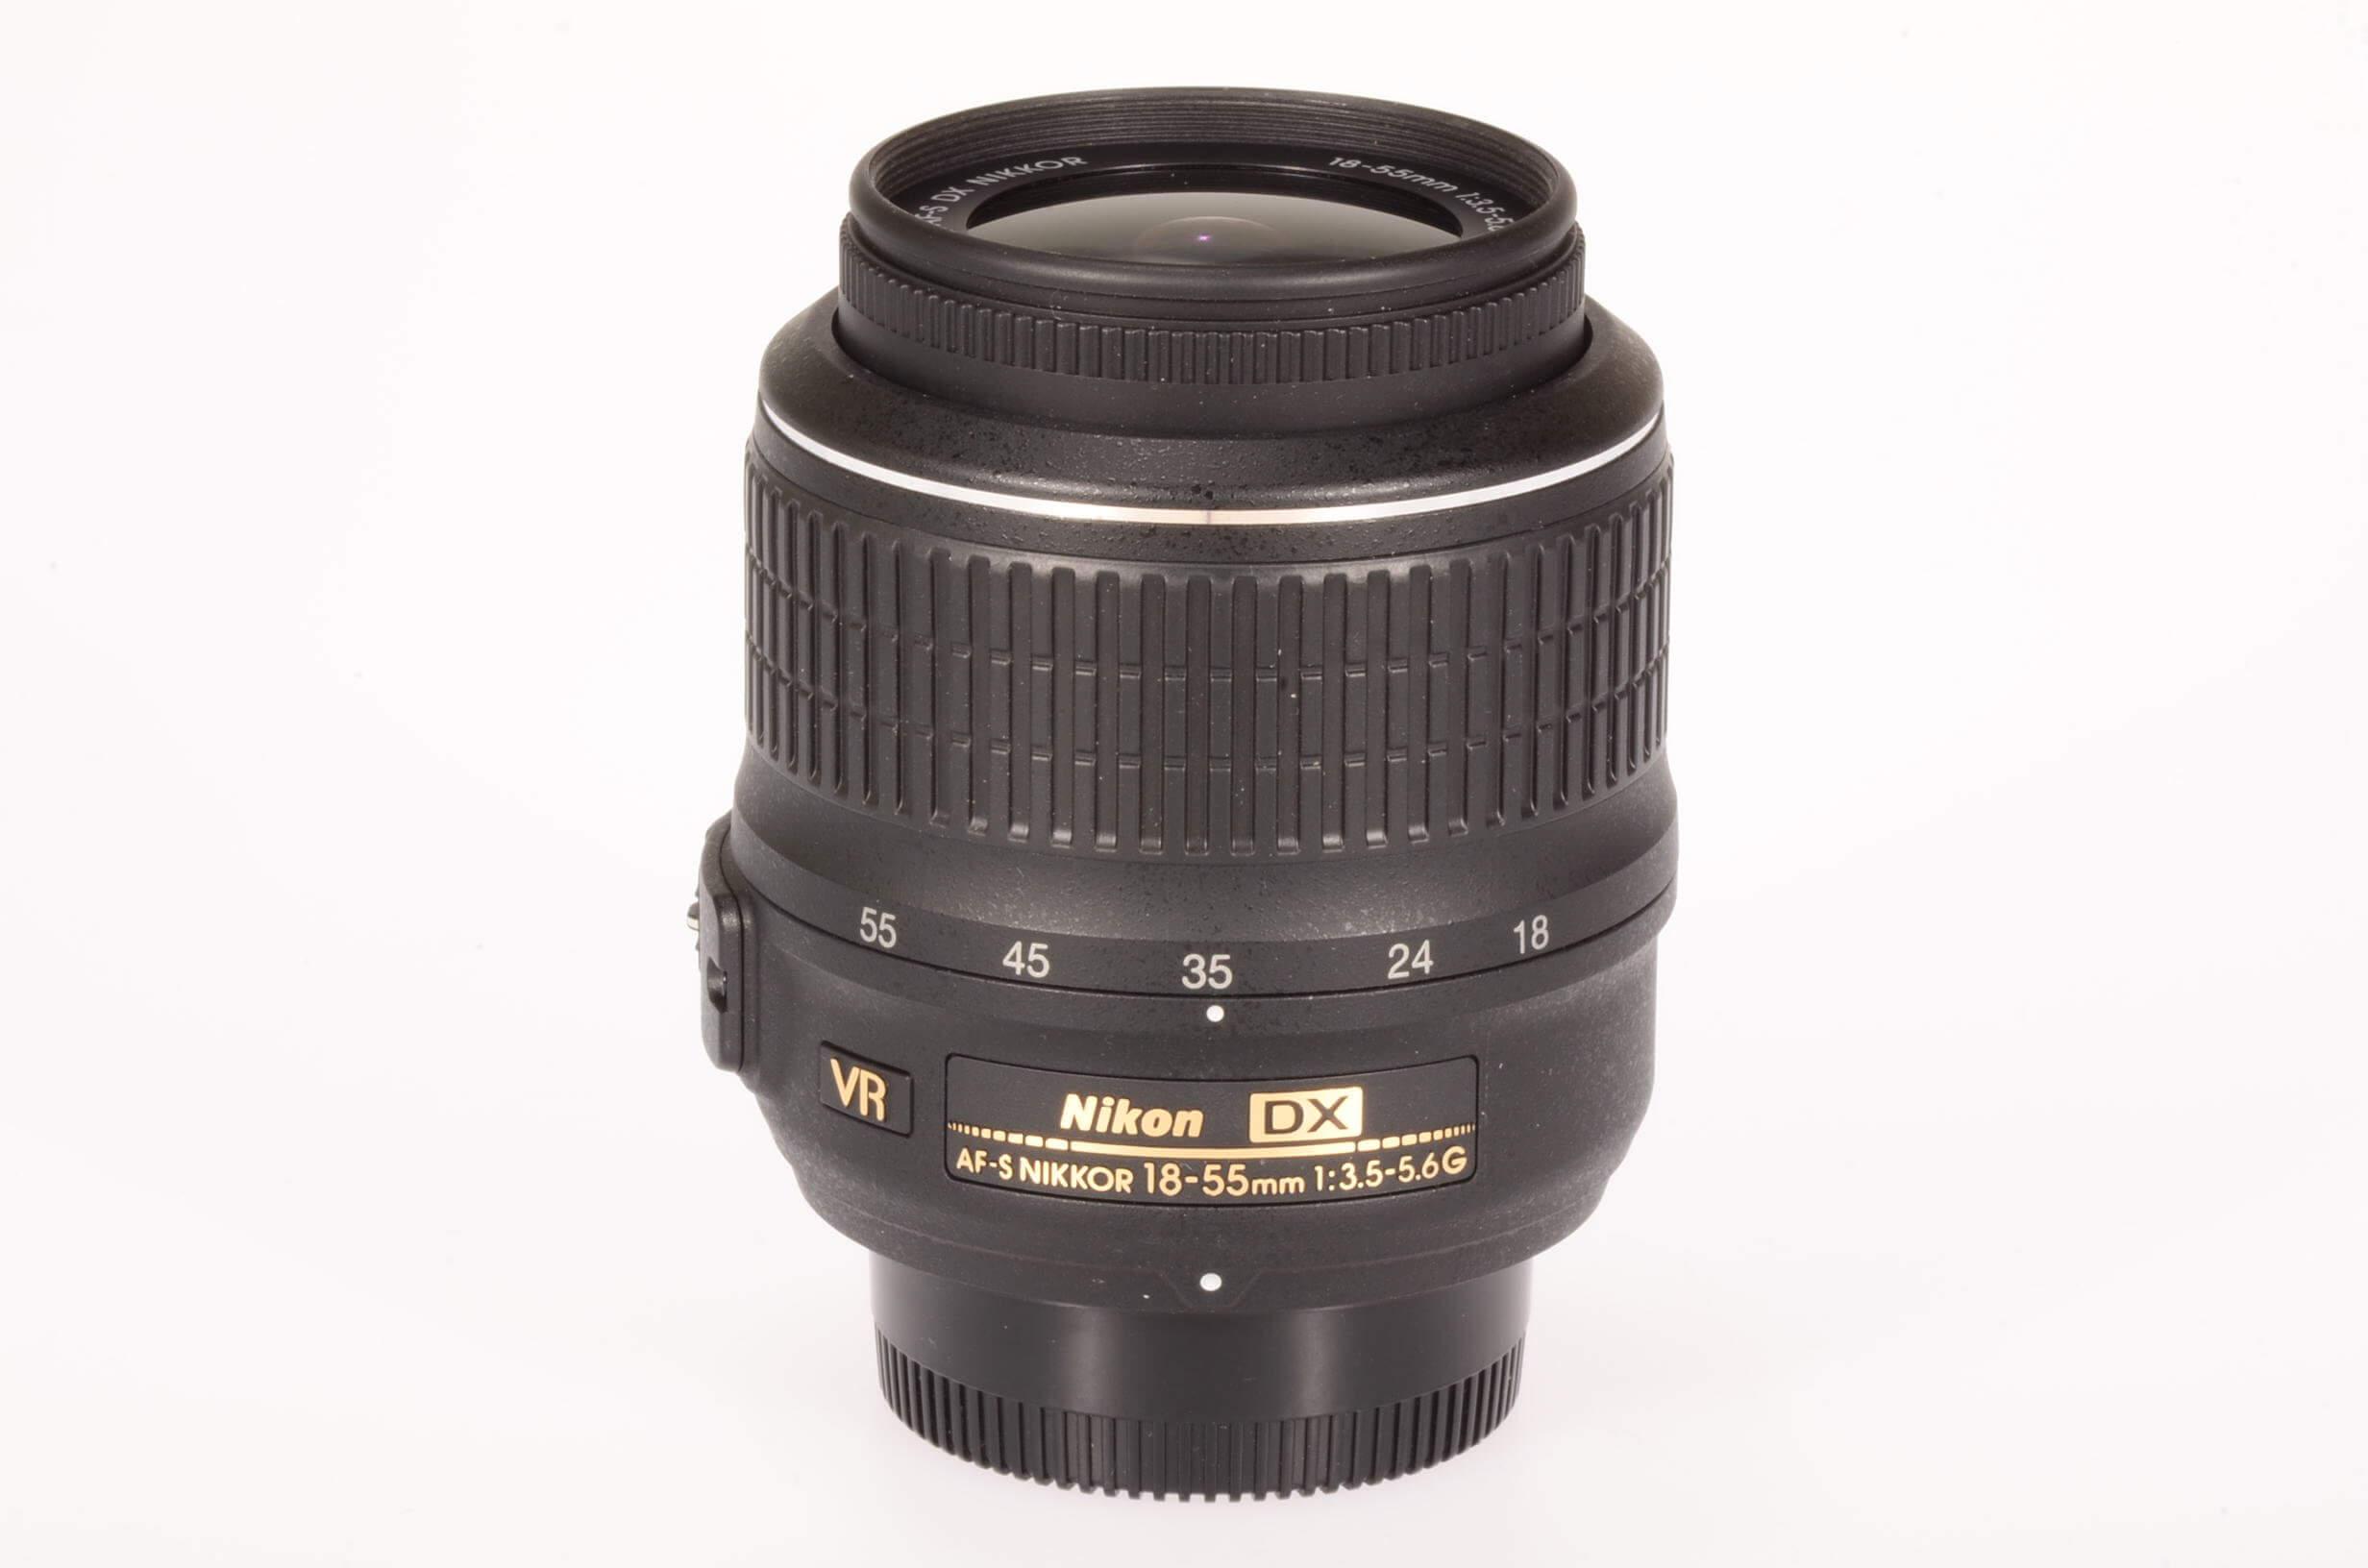 Nikon 18-55mm f3.5-5.6 DX AF-S VR, virtually mint!